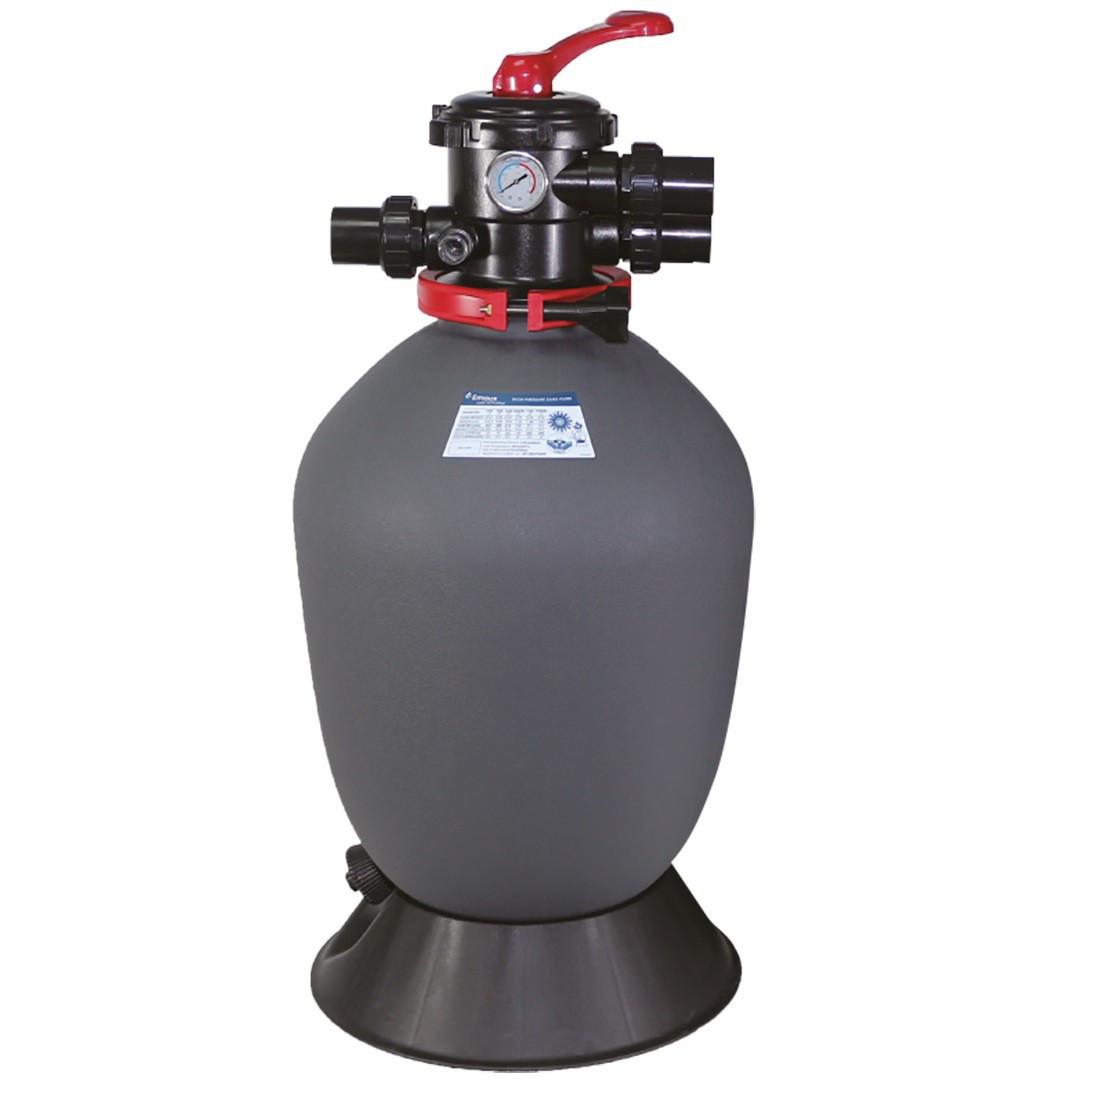 Фильтр Emaux T450 Volumetric (8 м³/час, D457)